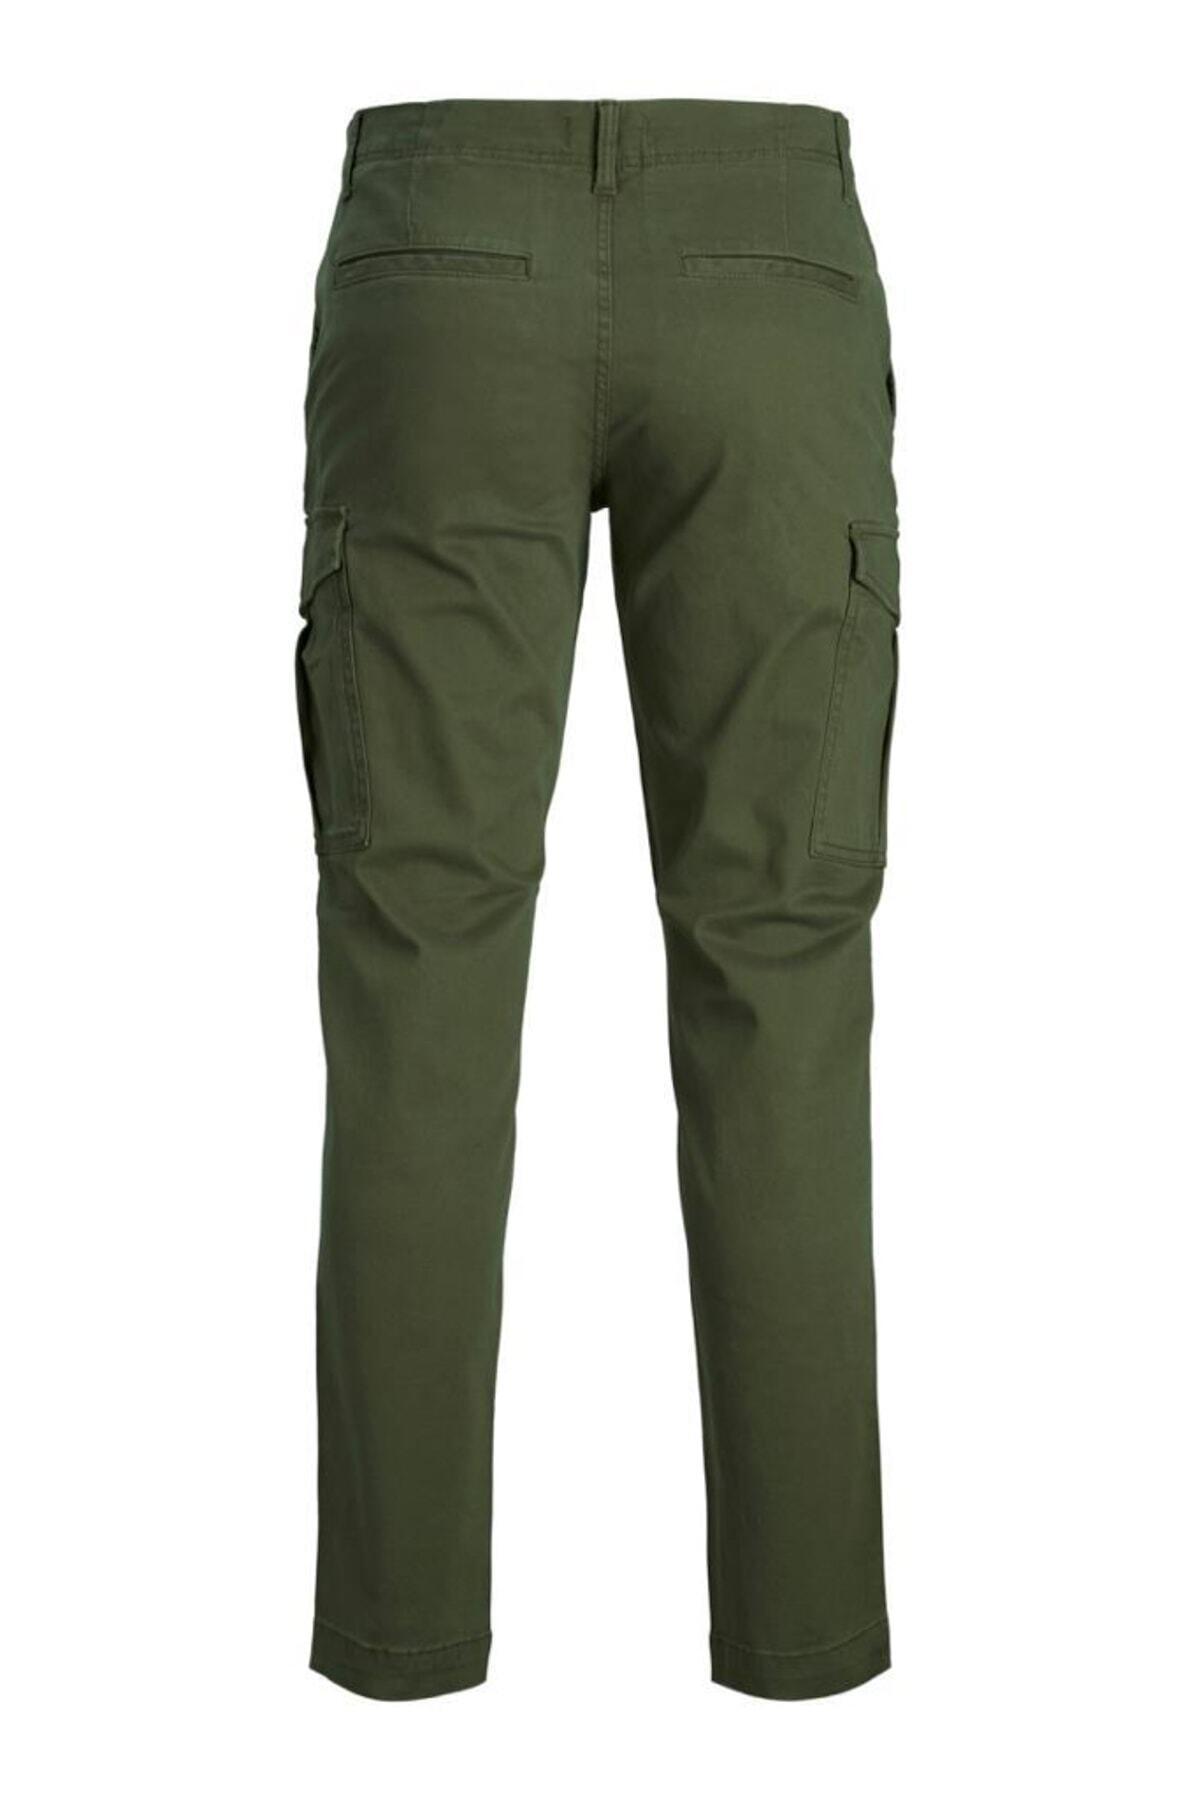 Jack & Jones Jack Jones Erkek Kargo Pantolon 12174184 2